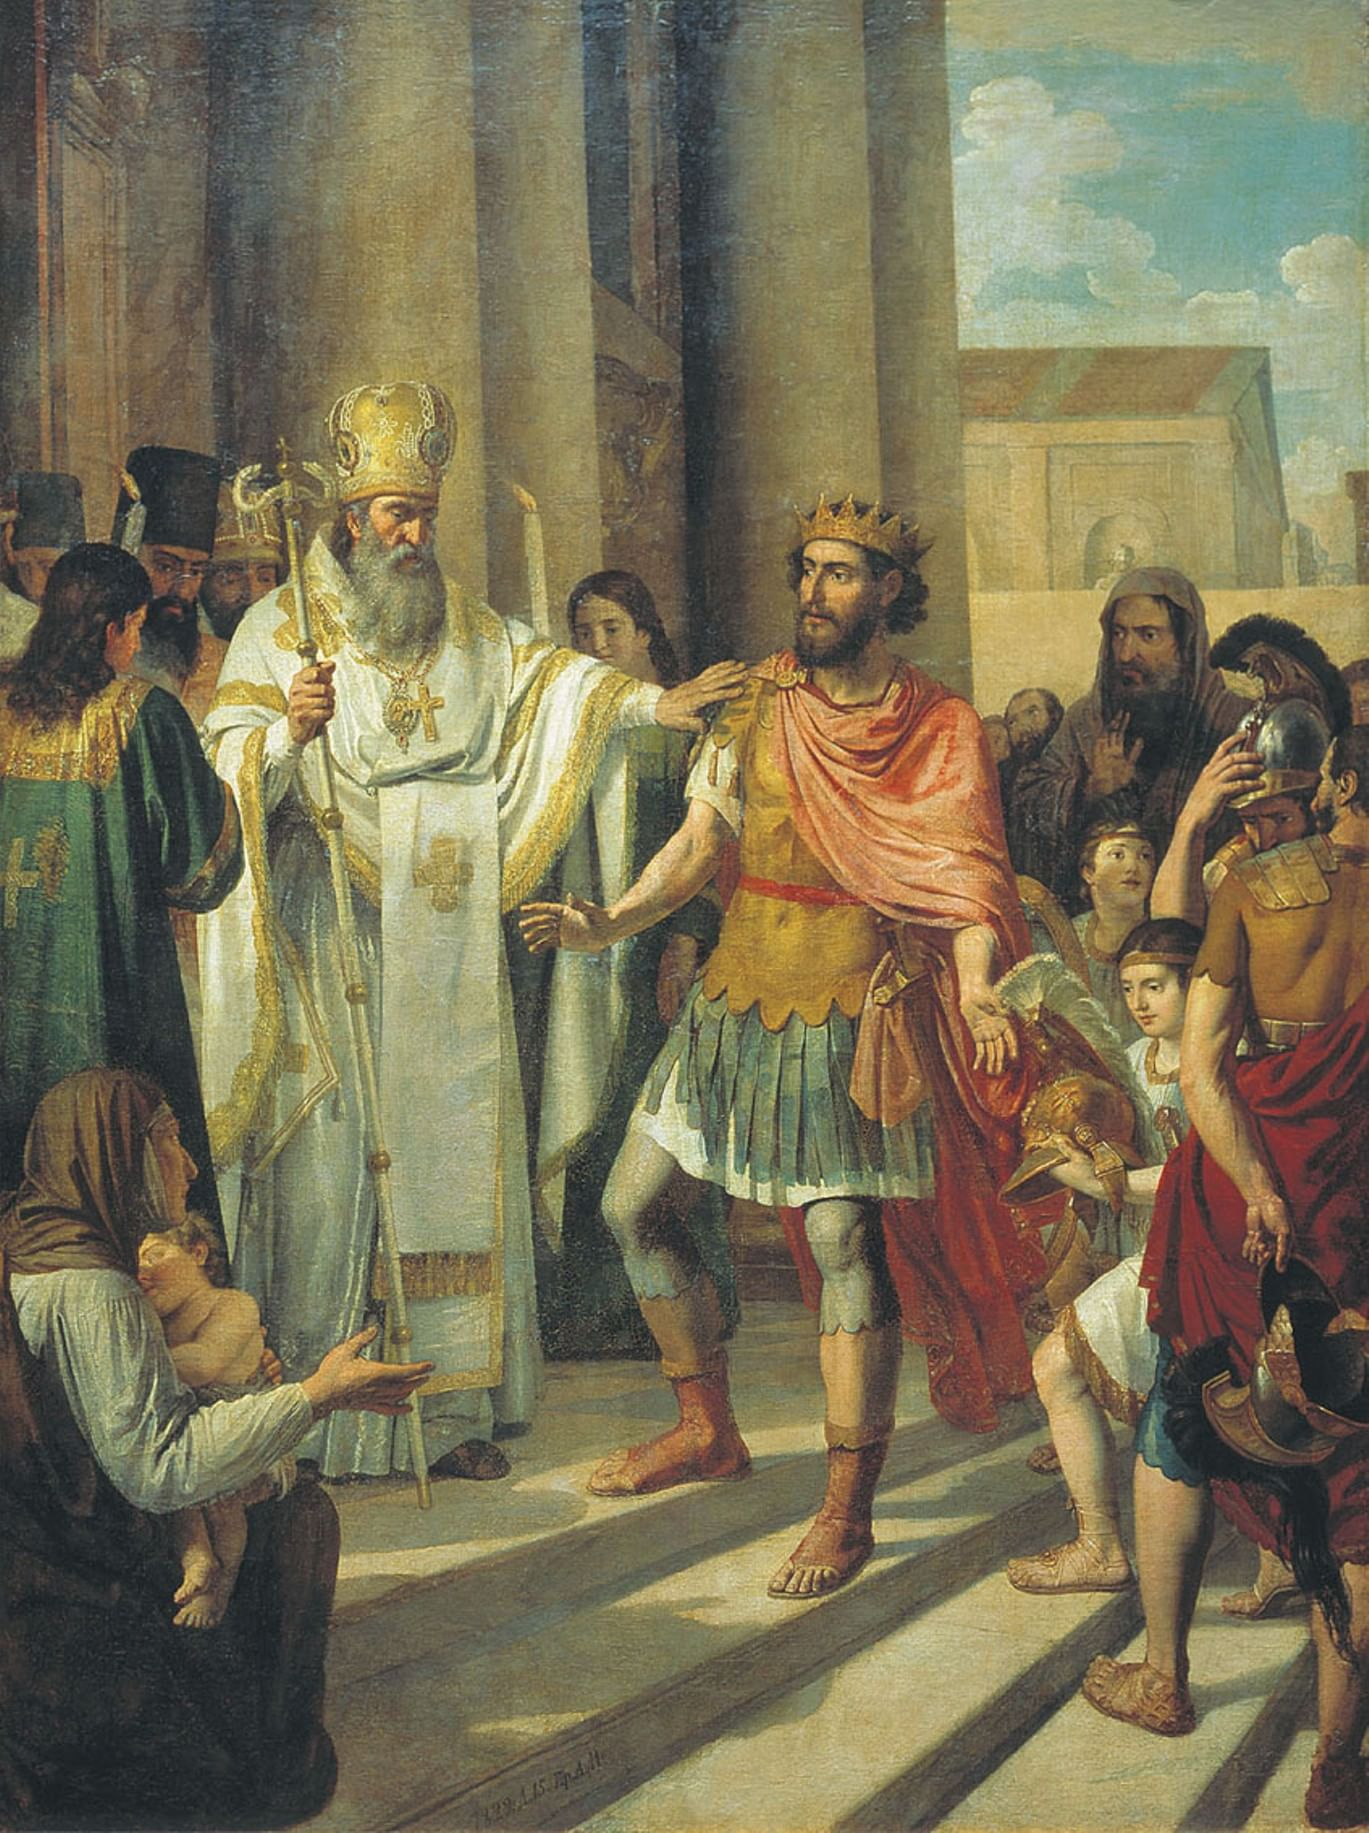 Влияние византии на русское искусство.